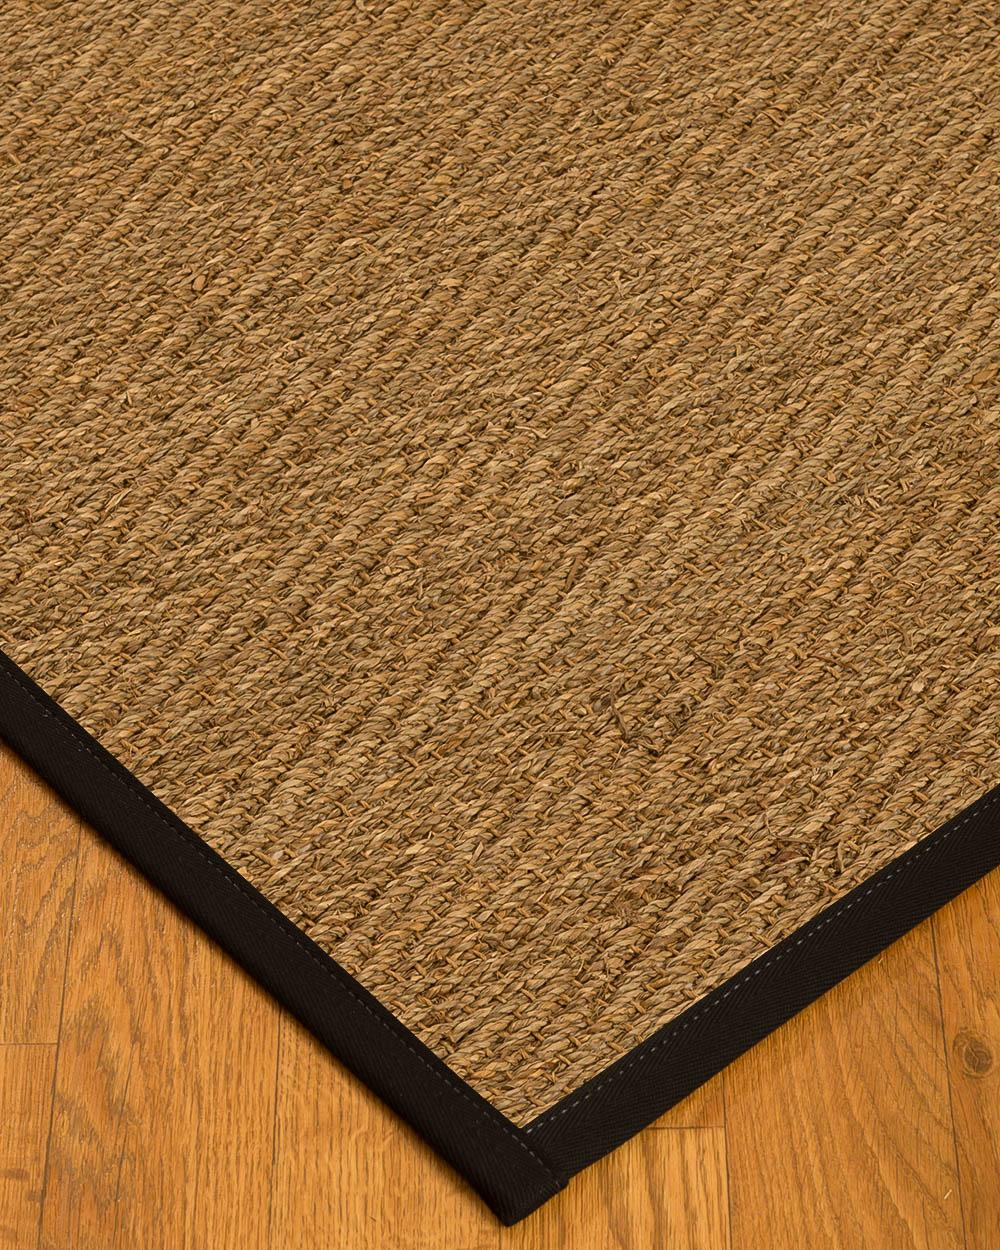 seagrass rugs beach custom seagrass rug PRFCBRP